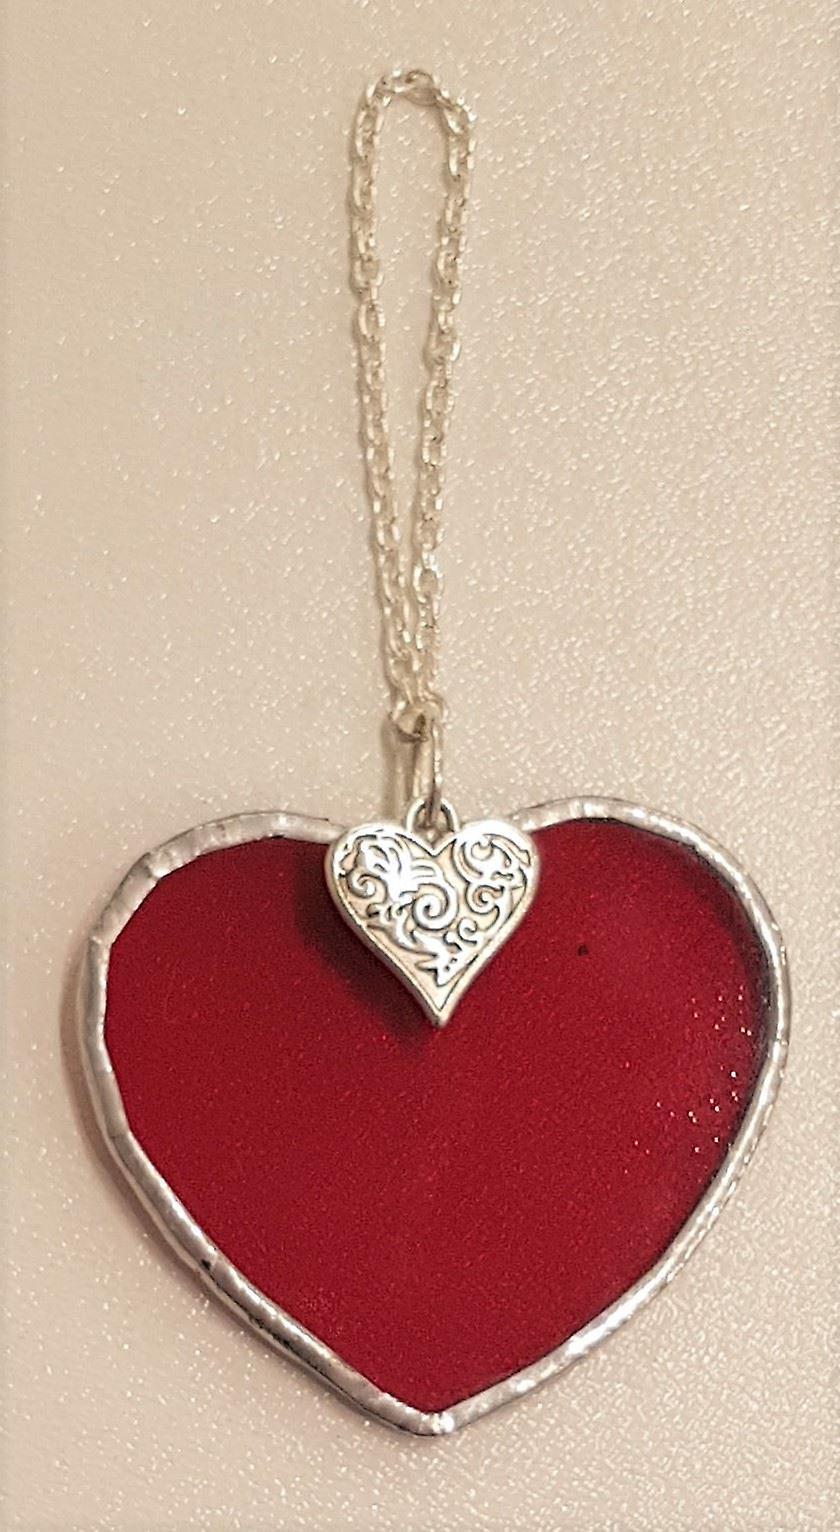 Simmerdim Design Small Dark Red Heart